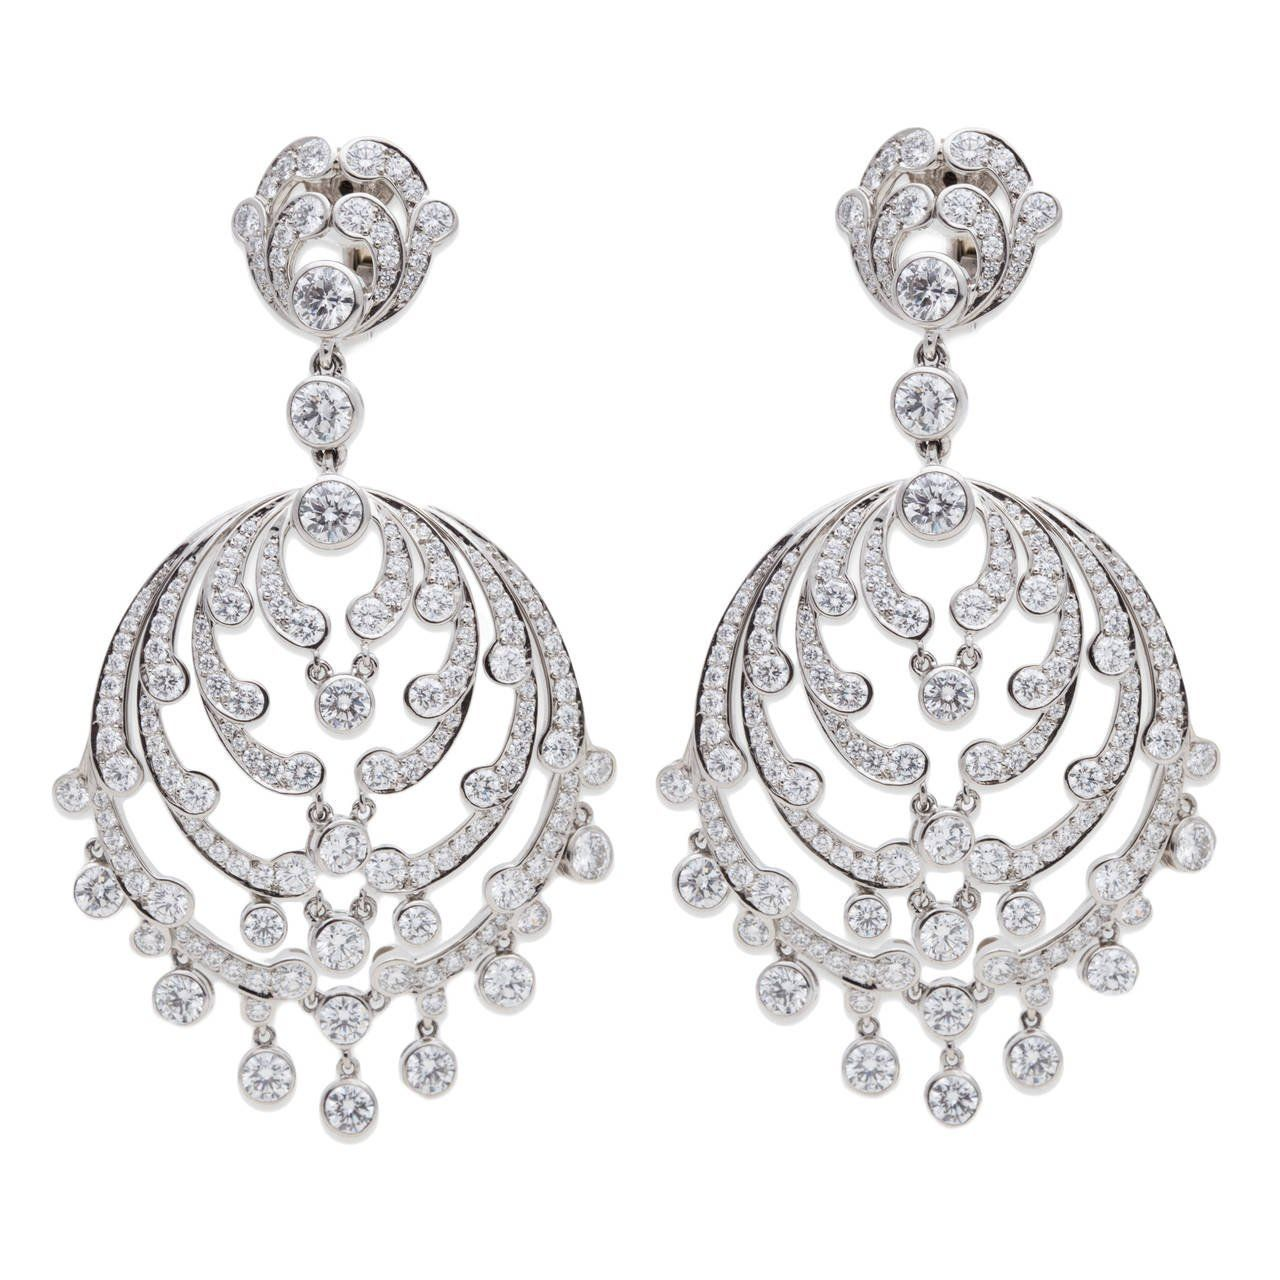 Cartier diamond platinum chandelier earrings chandelier earrings cartier diamond platinum chandelier earrings arubaitofo Choice Image